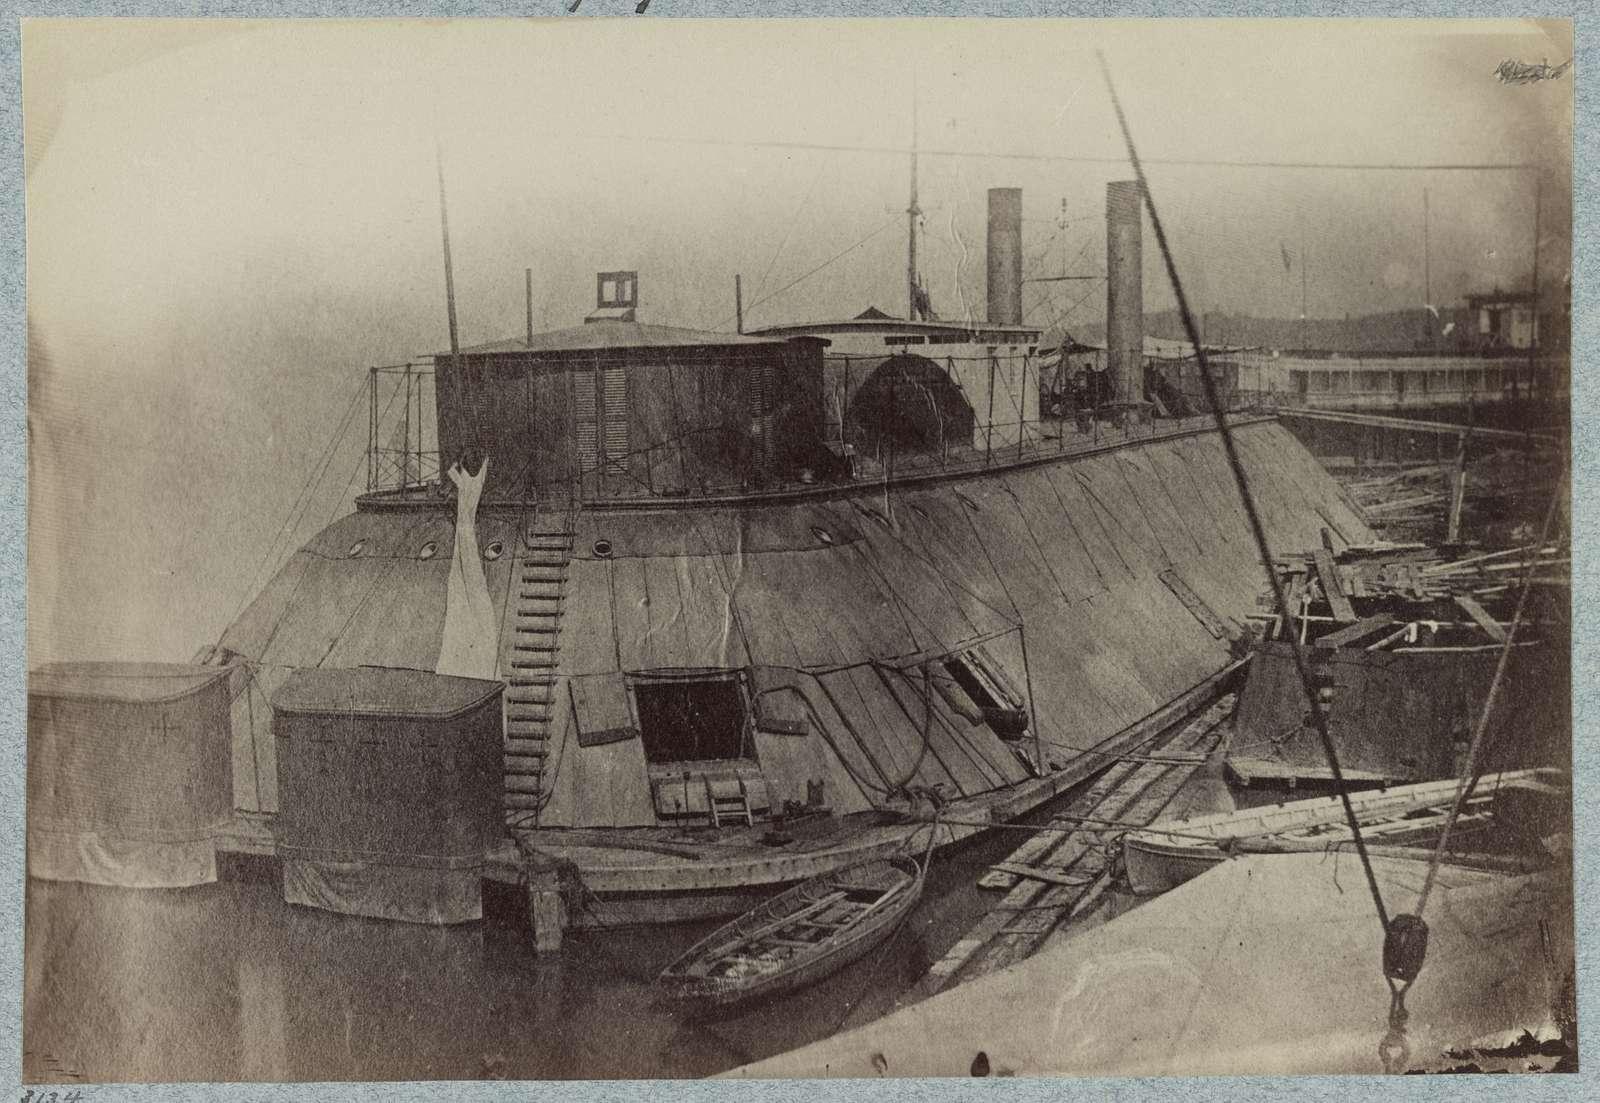 U.S. gunboat Essex - Mississippi River Fleet